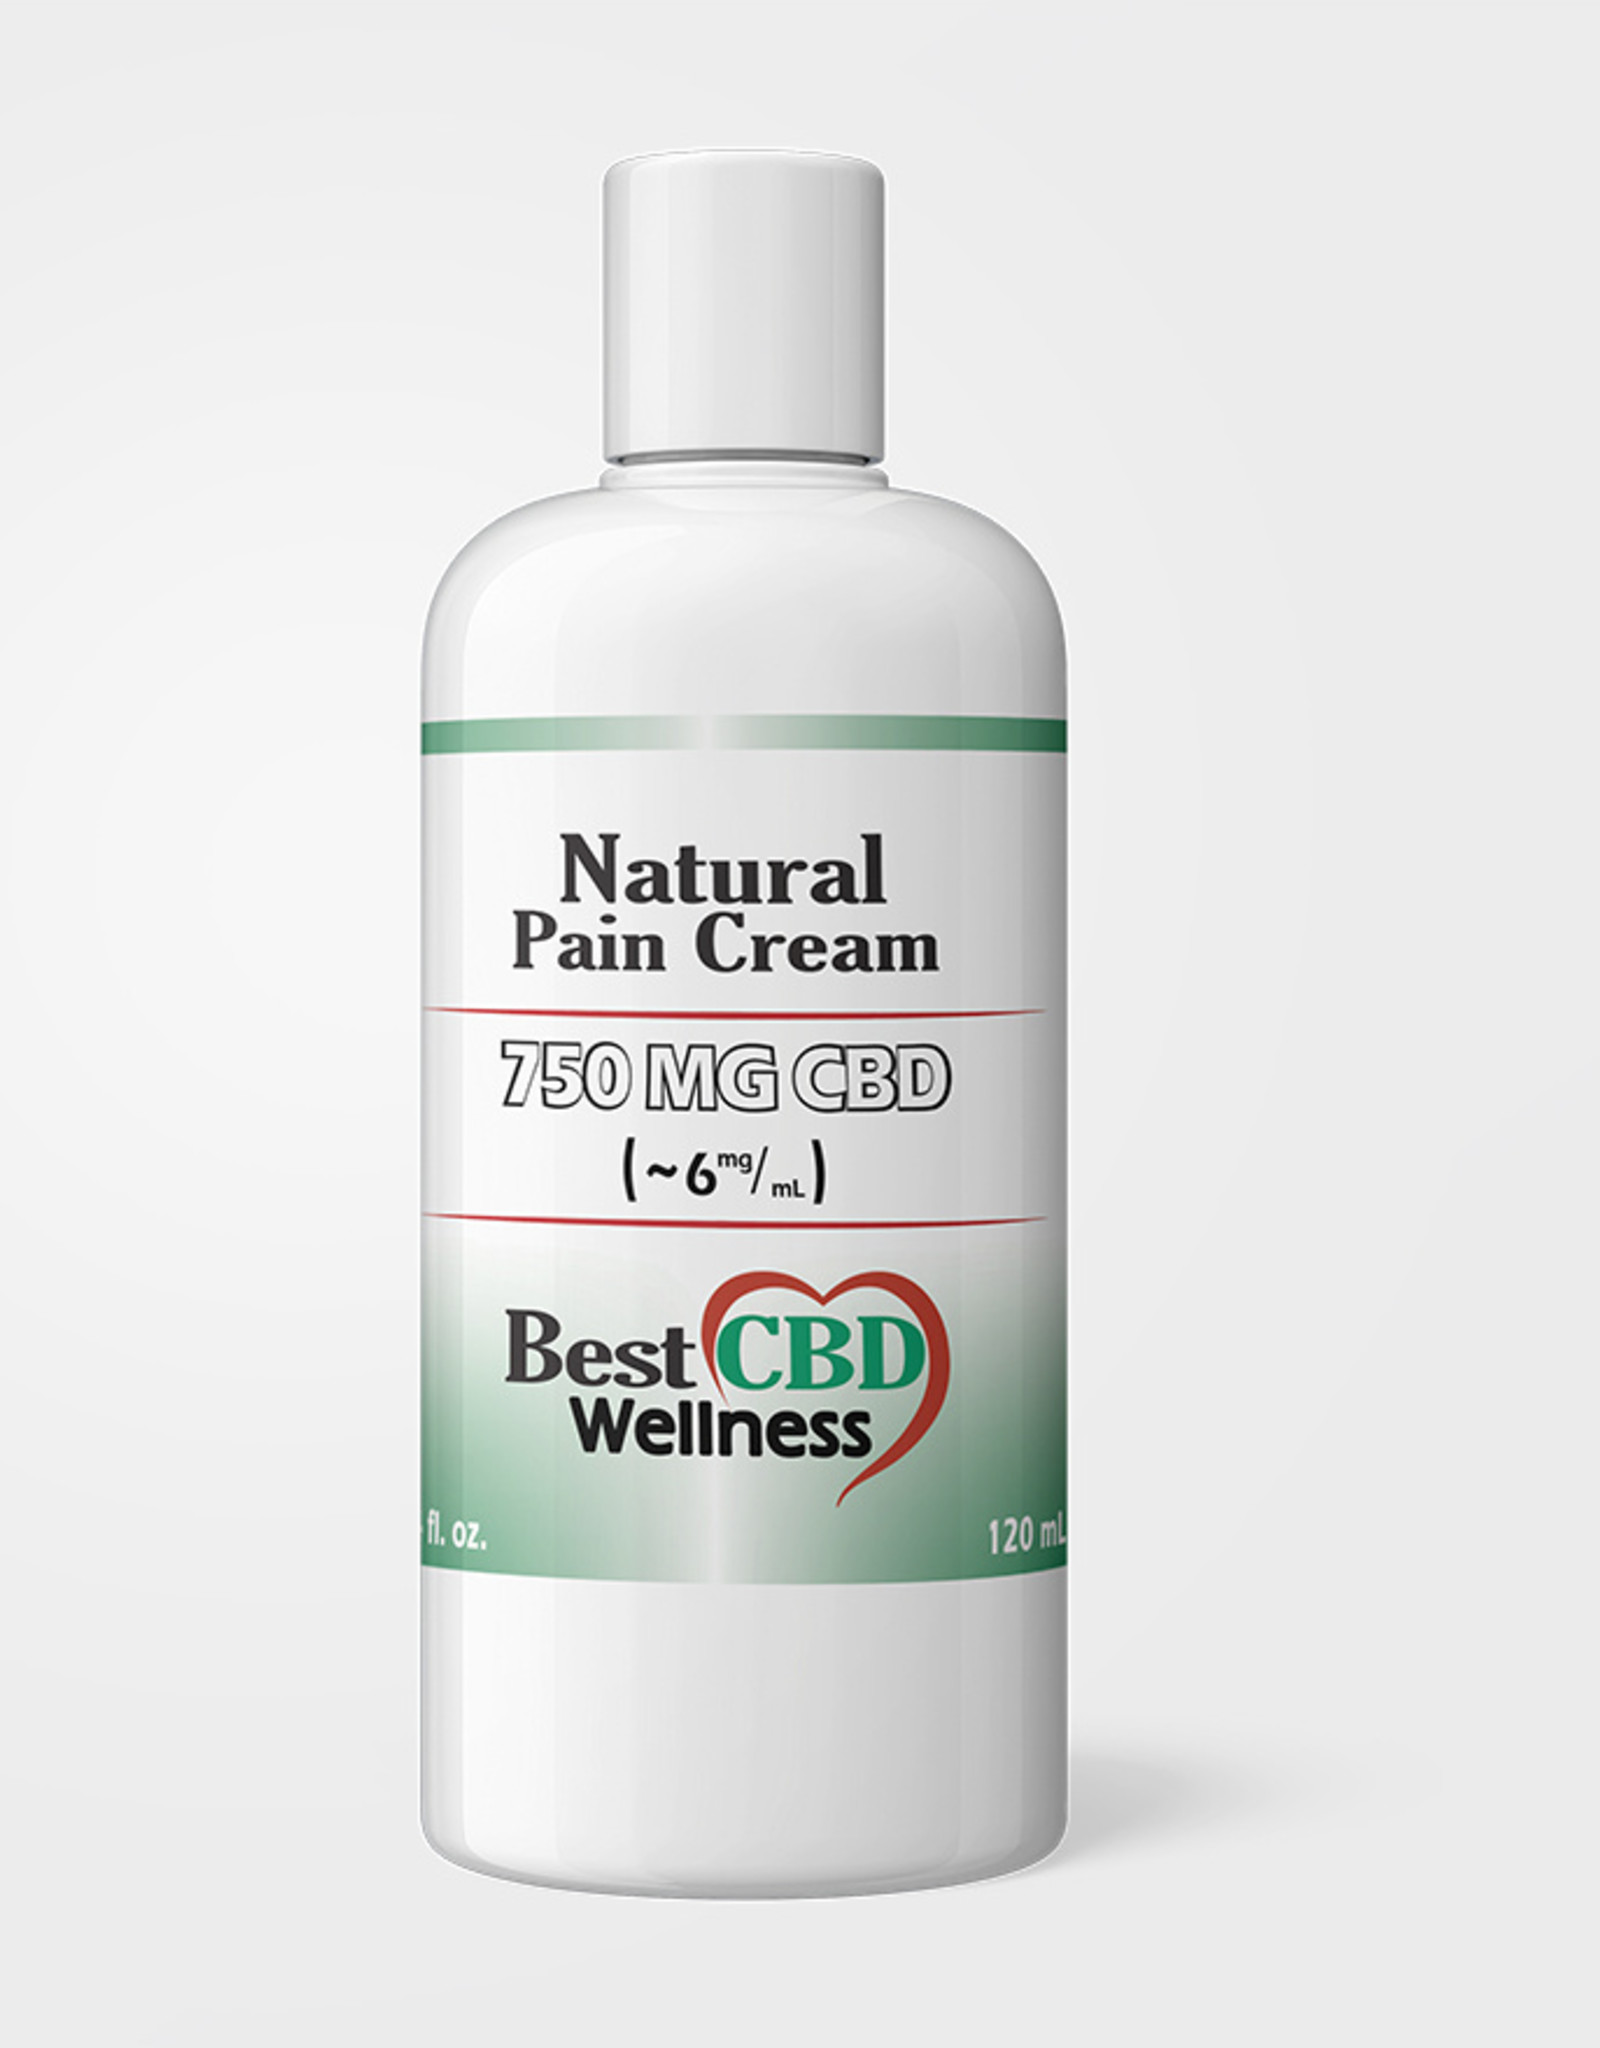 Best CBD Wellness Isolate CBD Natural Pain Cream 750mg 4oz